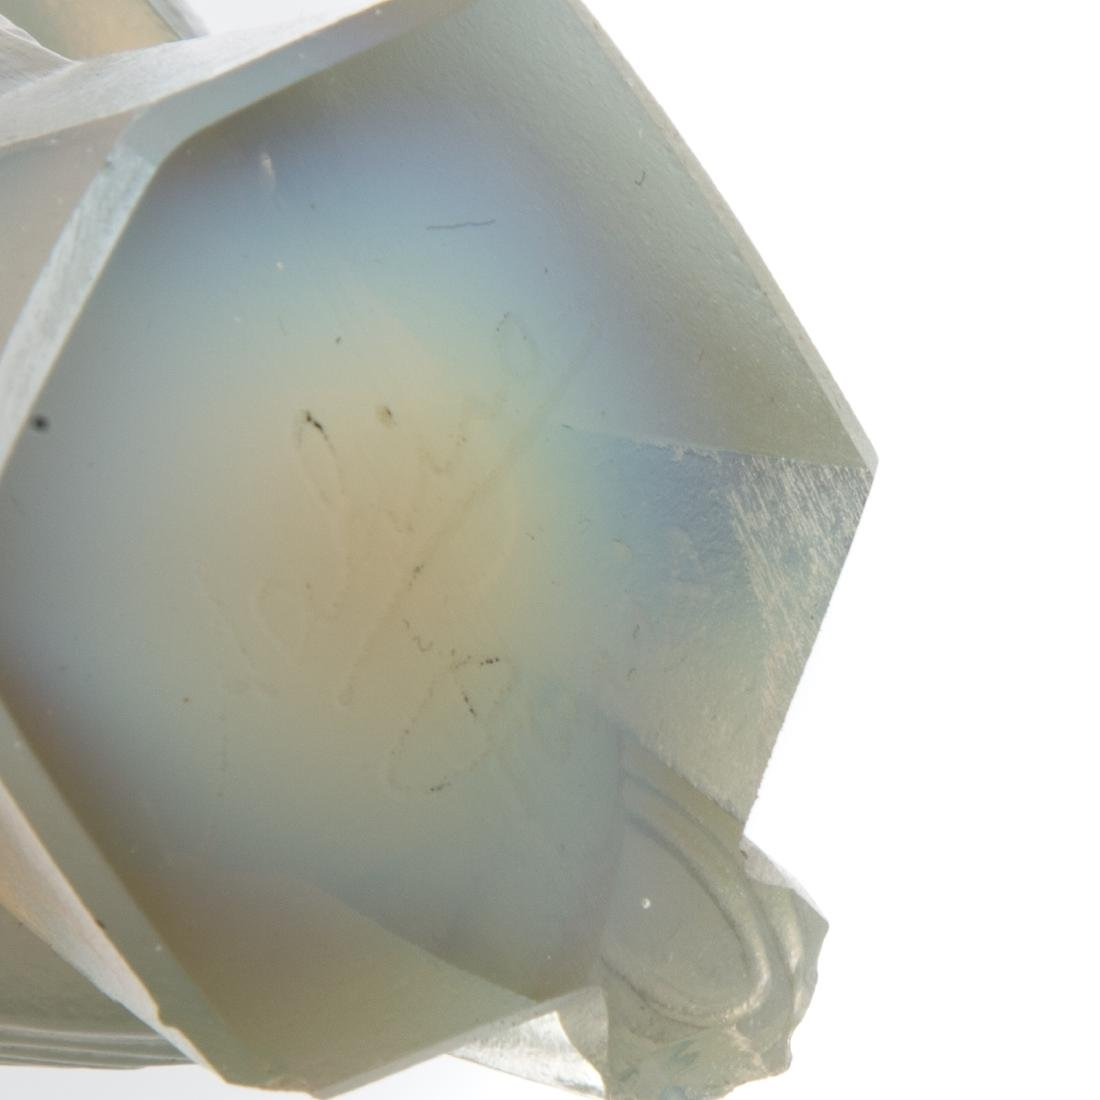 Sabino glass torso, songbird, and Lalique vase - 5